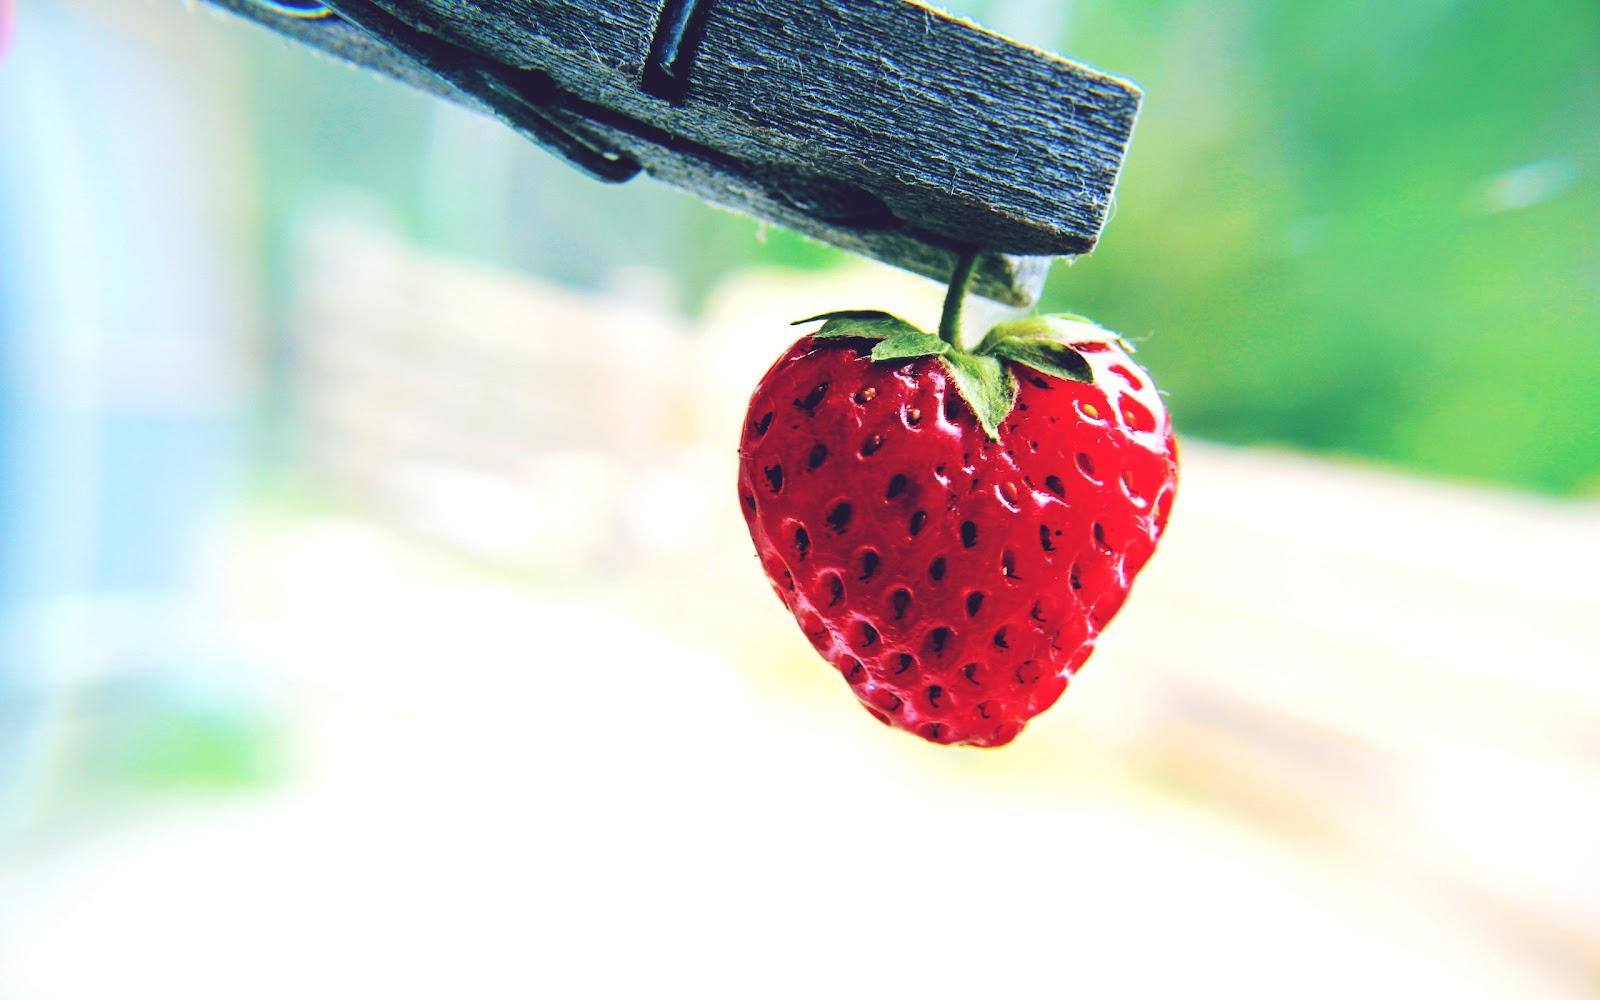 fruit strawberries 4 - photo #7